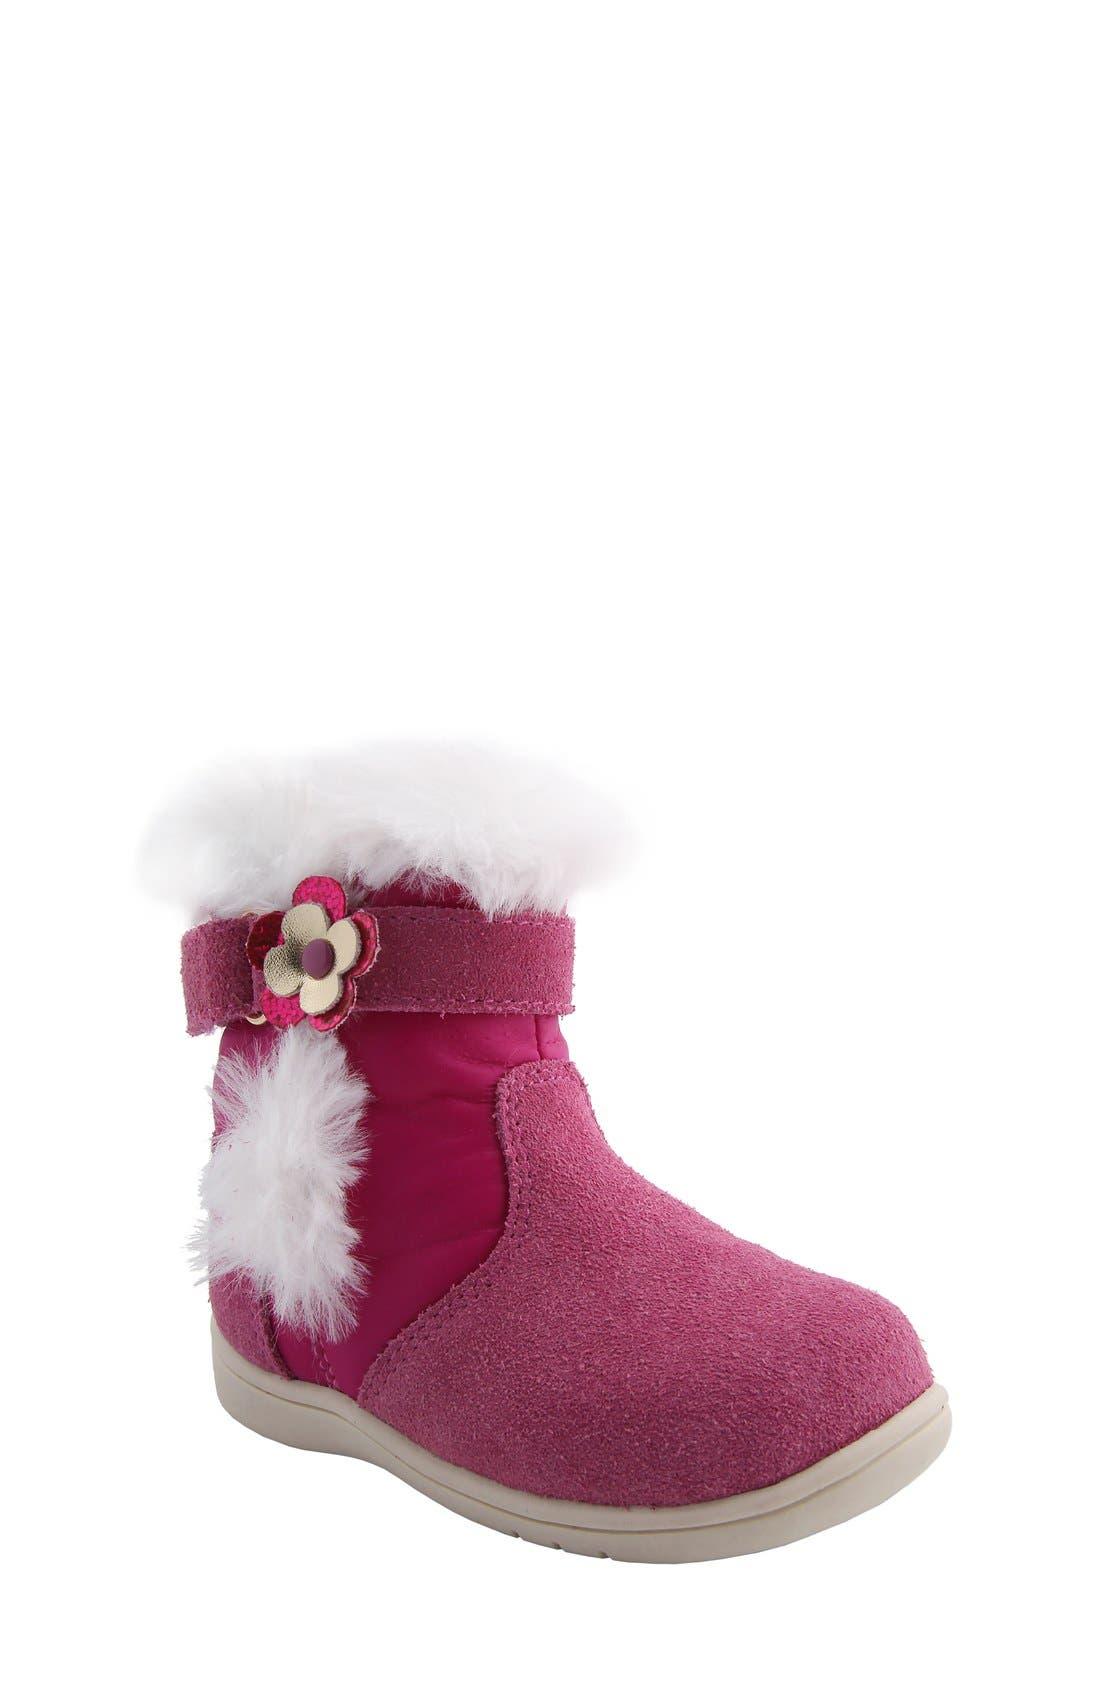 Nina 'Anya' Faux Fur Bootie,                             Main thumbnail 1, color,                             Pink Suede